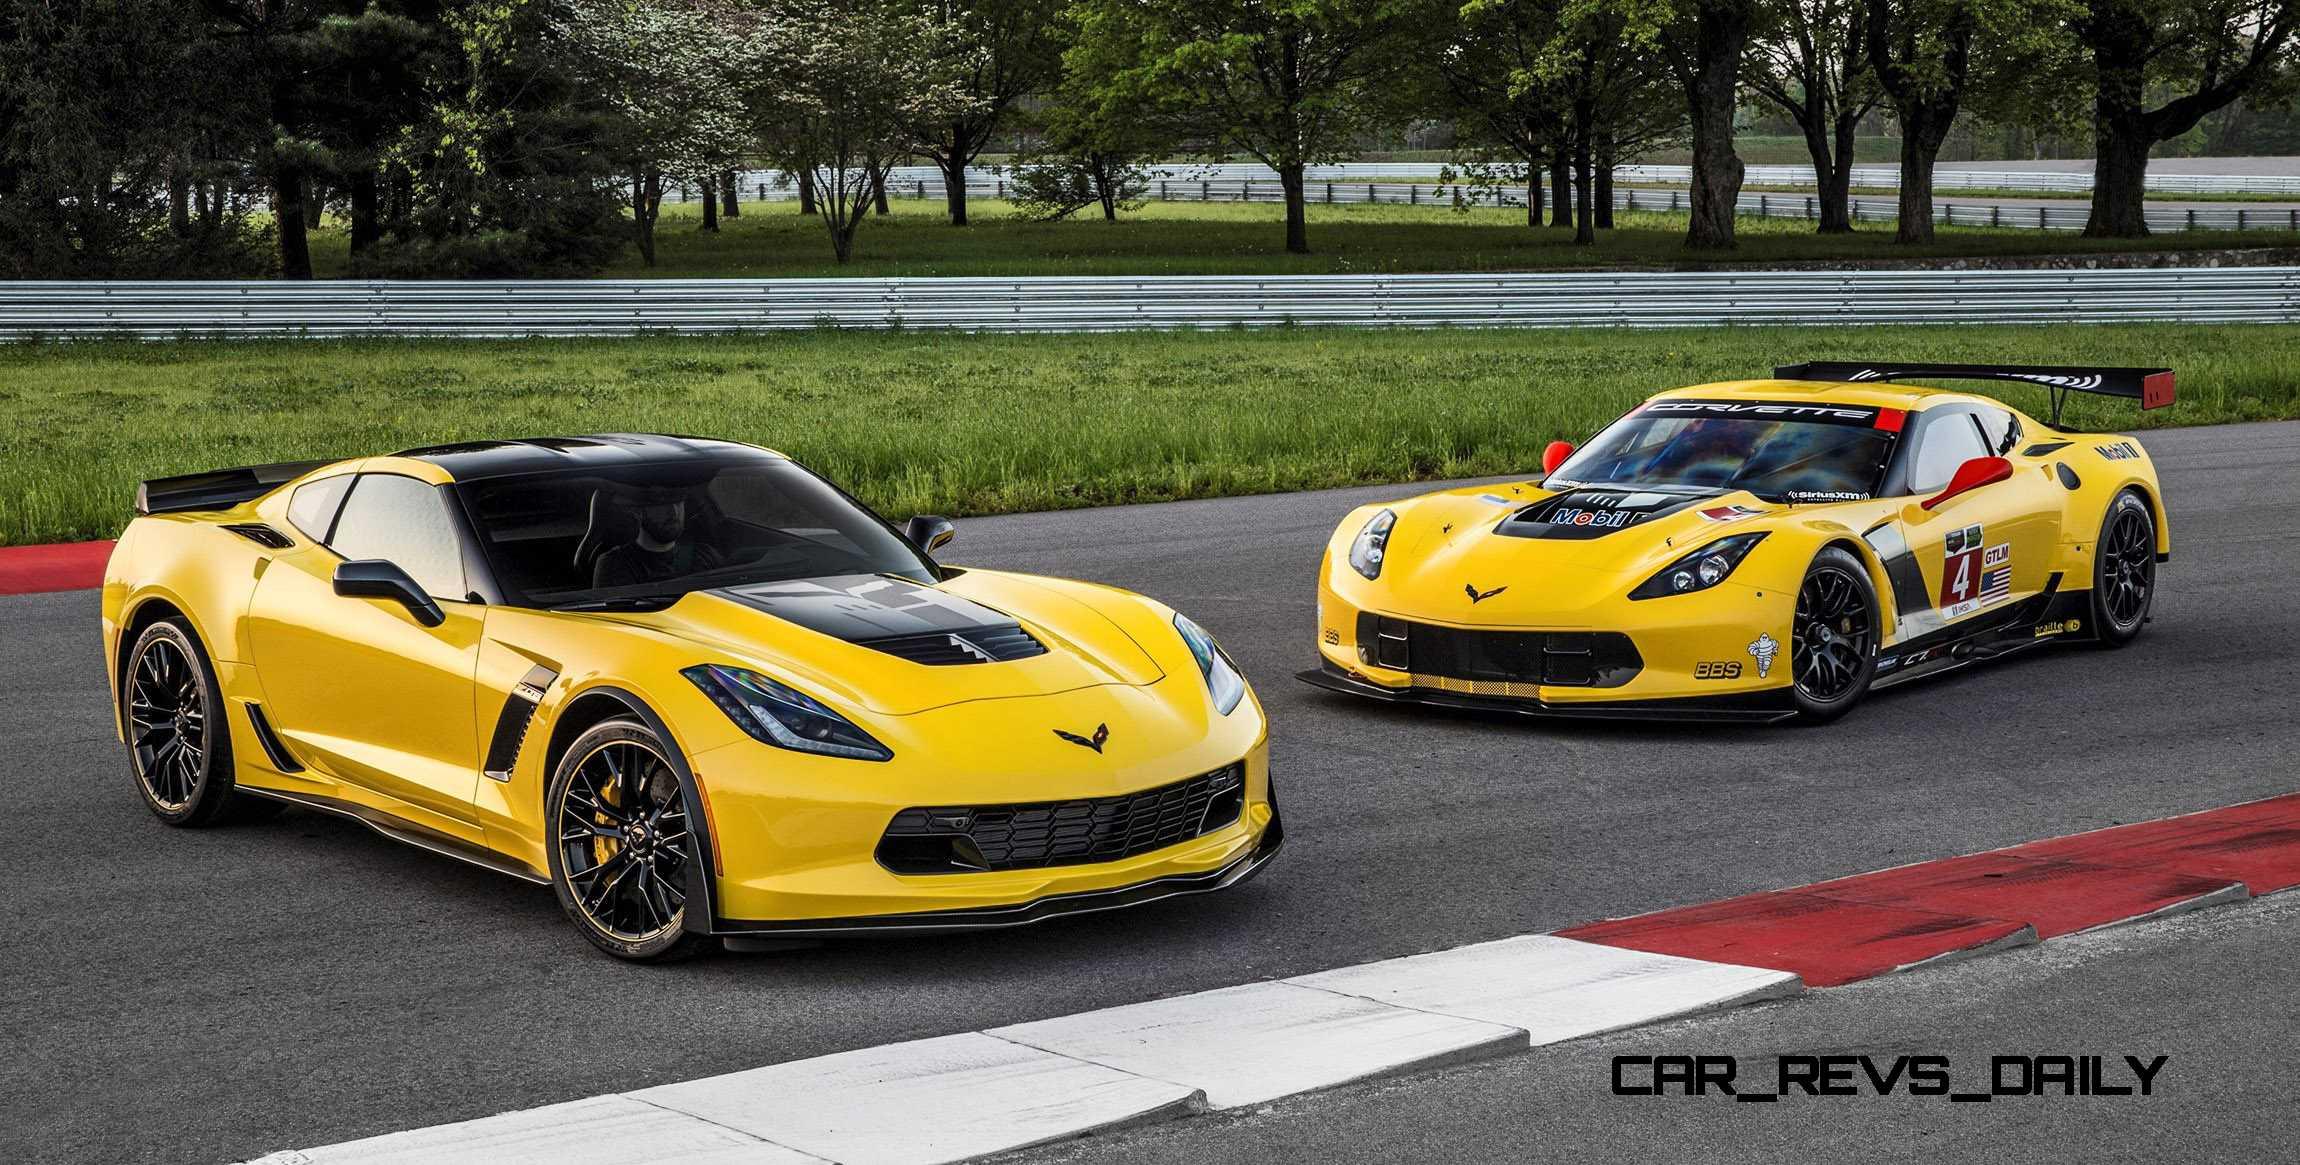 2016 corvette z06 c7 - 2016 Corvette Stingray And Z06 Spice Red Design Package